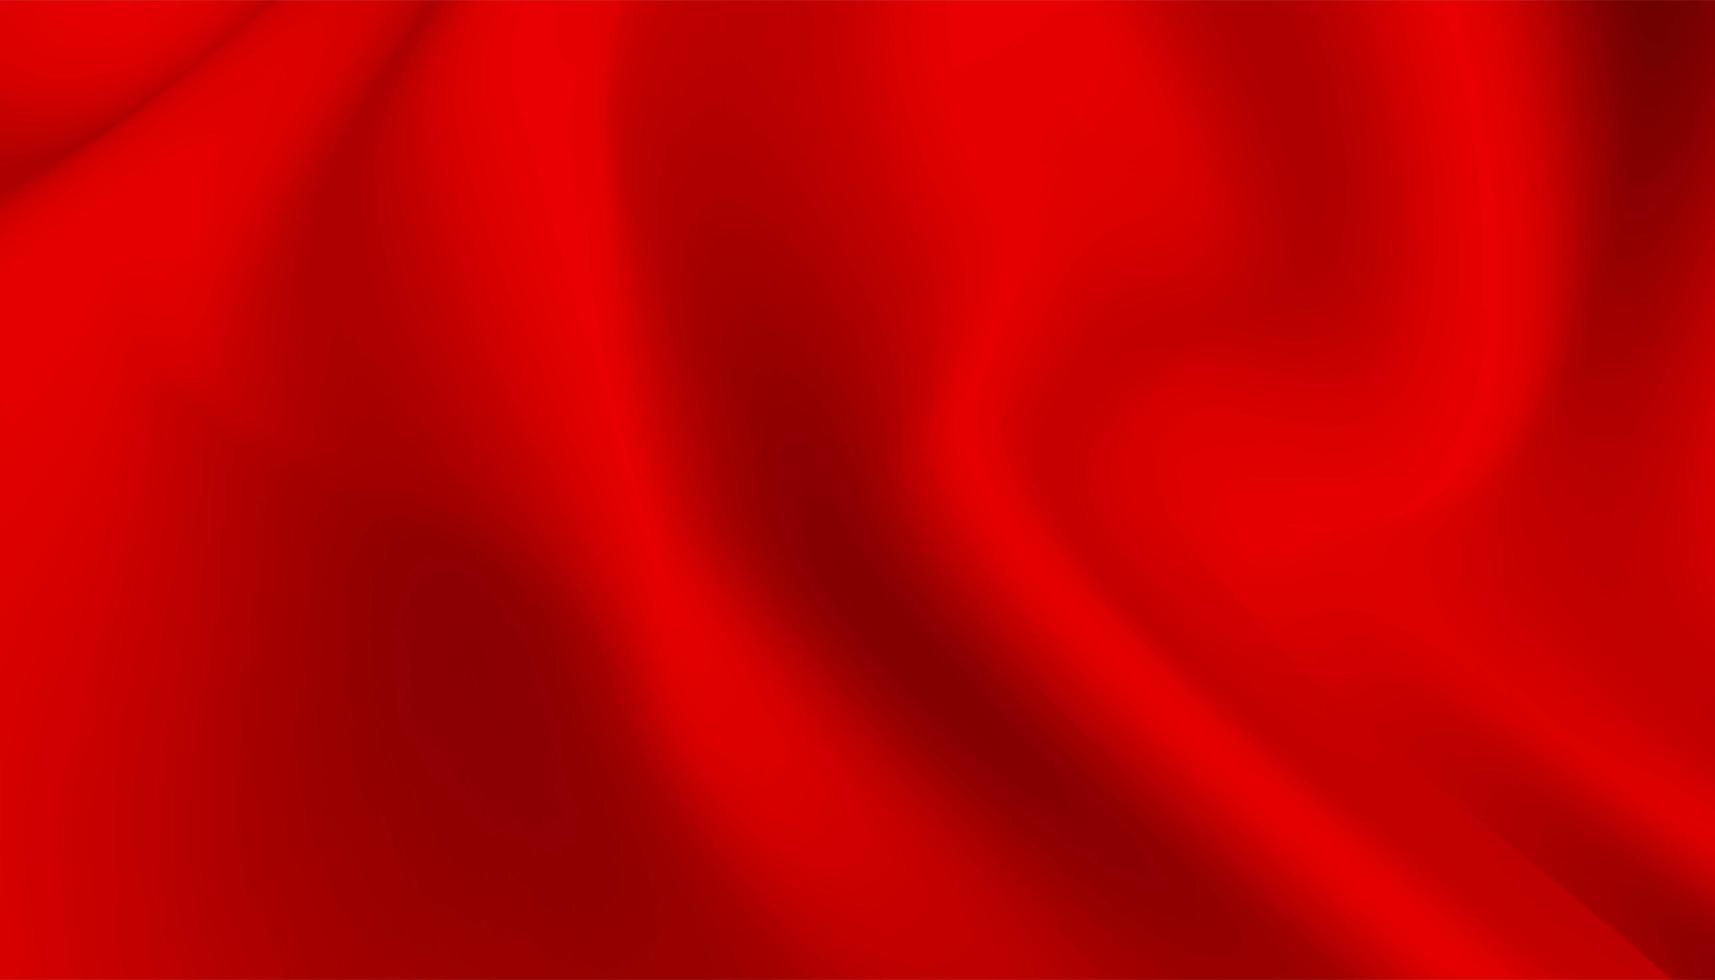 rood van vlag achtergrond vector